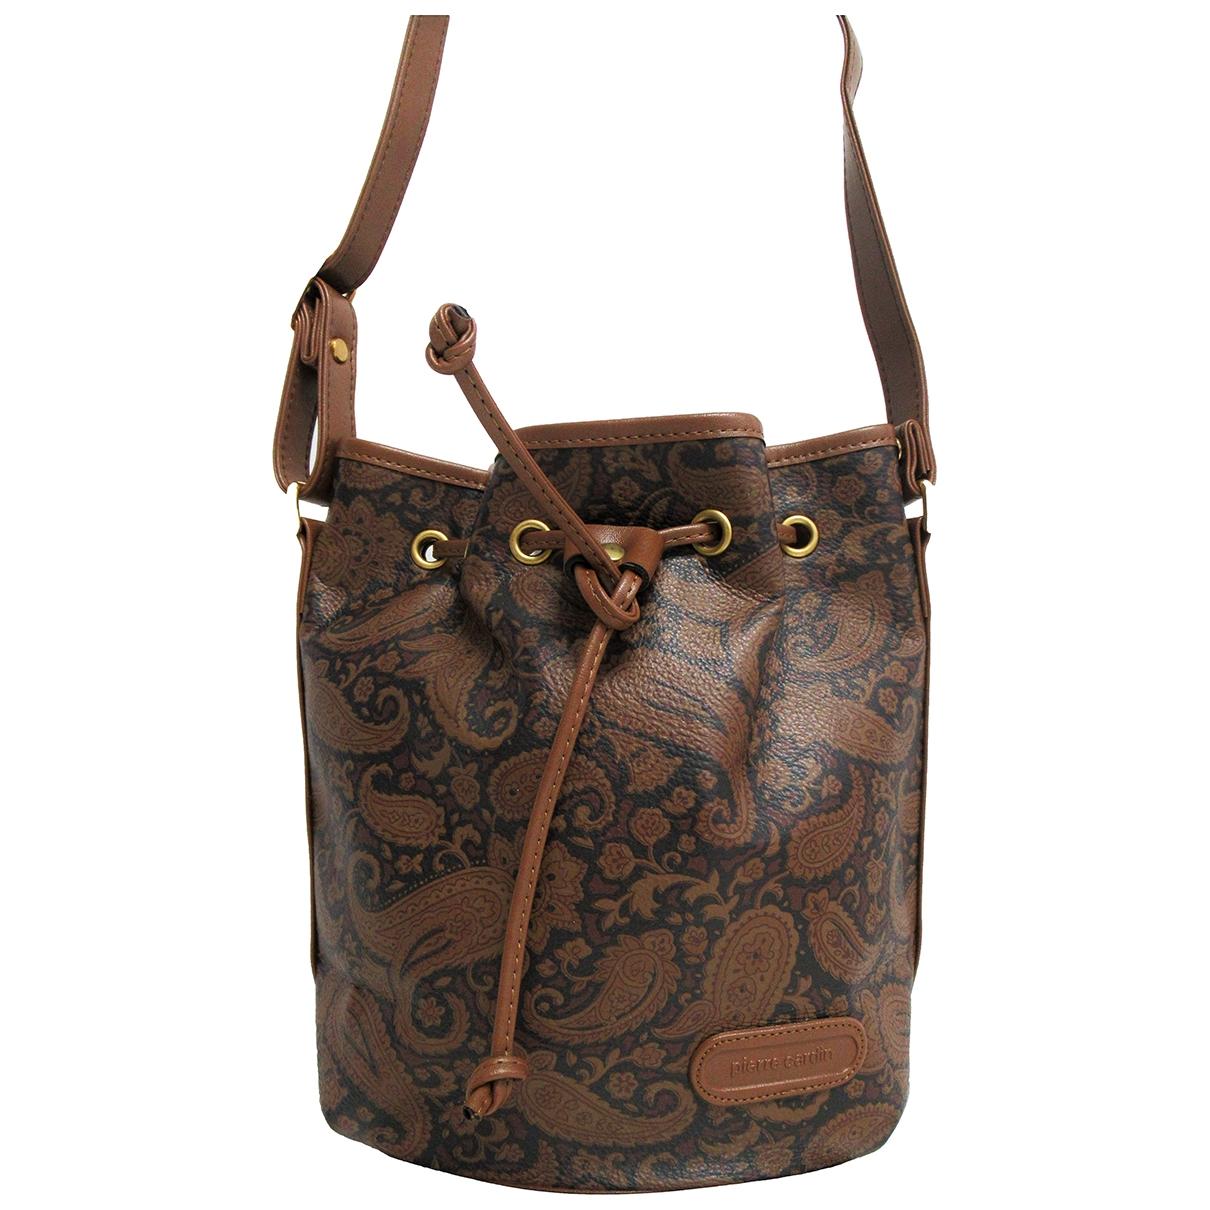 Pierre Cardin \N Multicolour handbag for Women \N